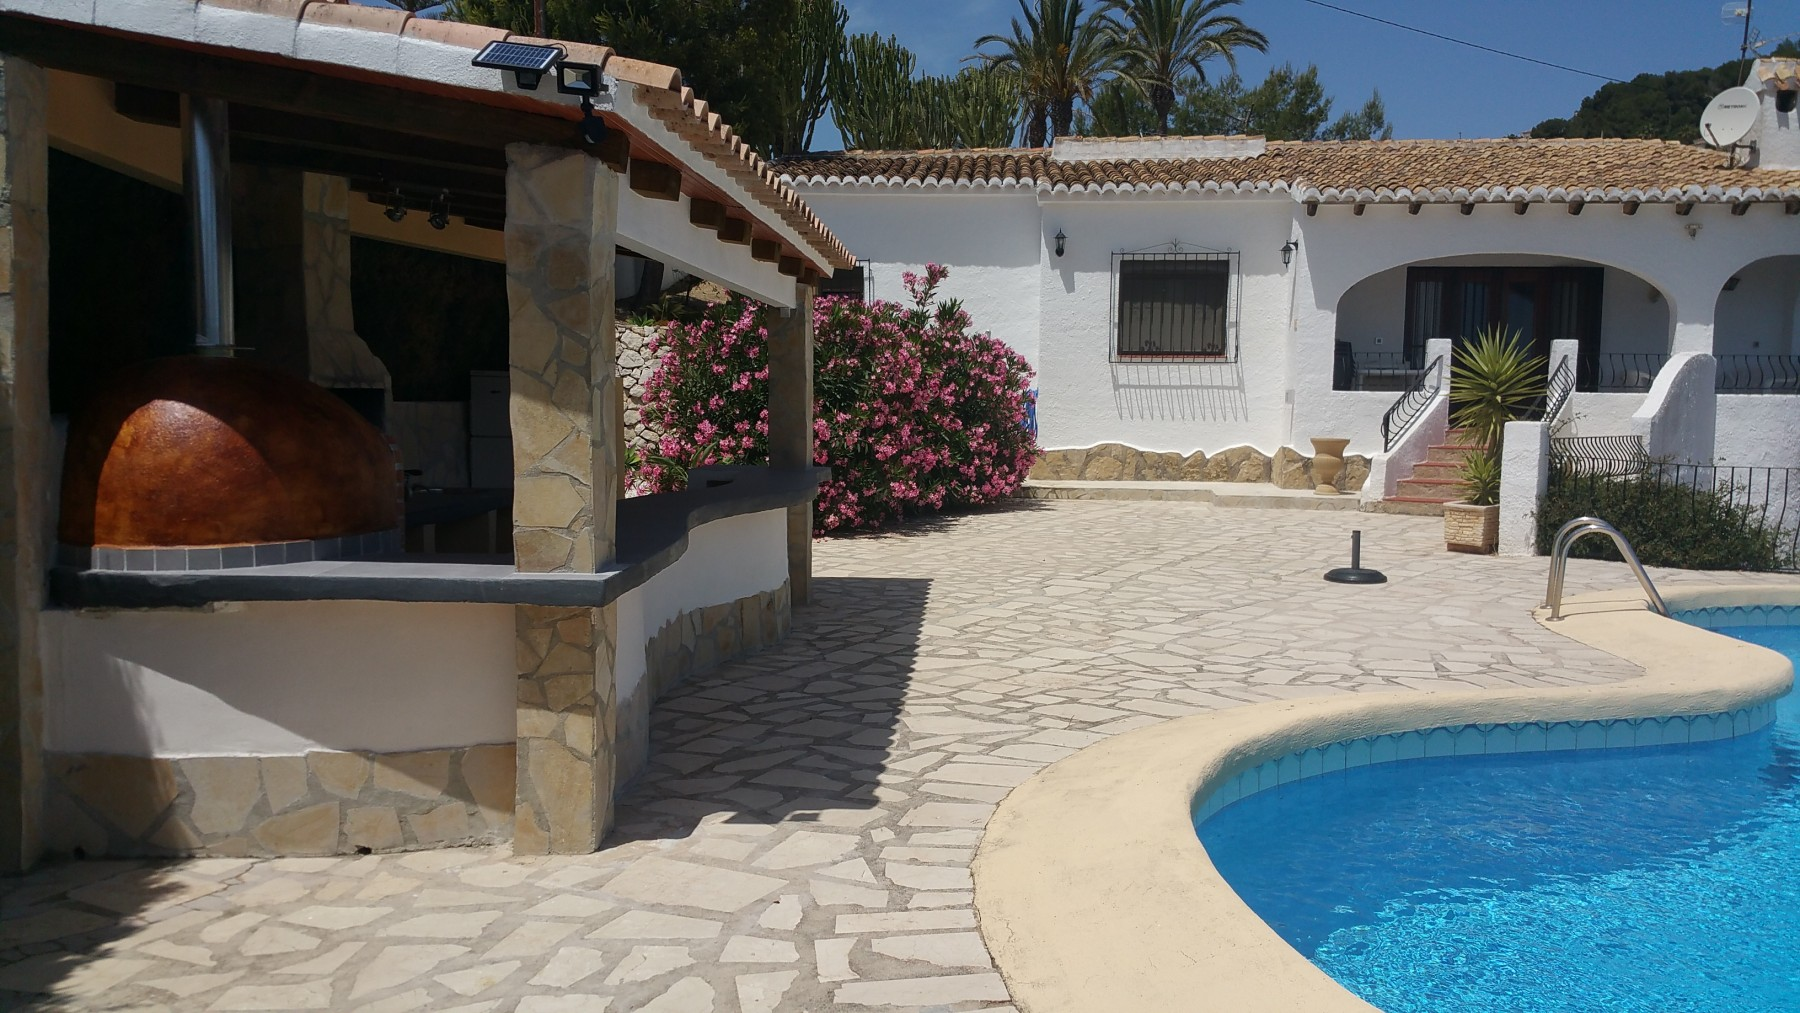 Villa Rodez,Teulada,Costa Blanca #2